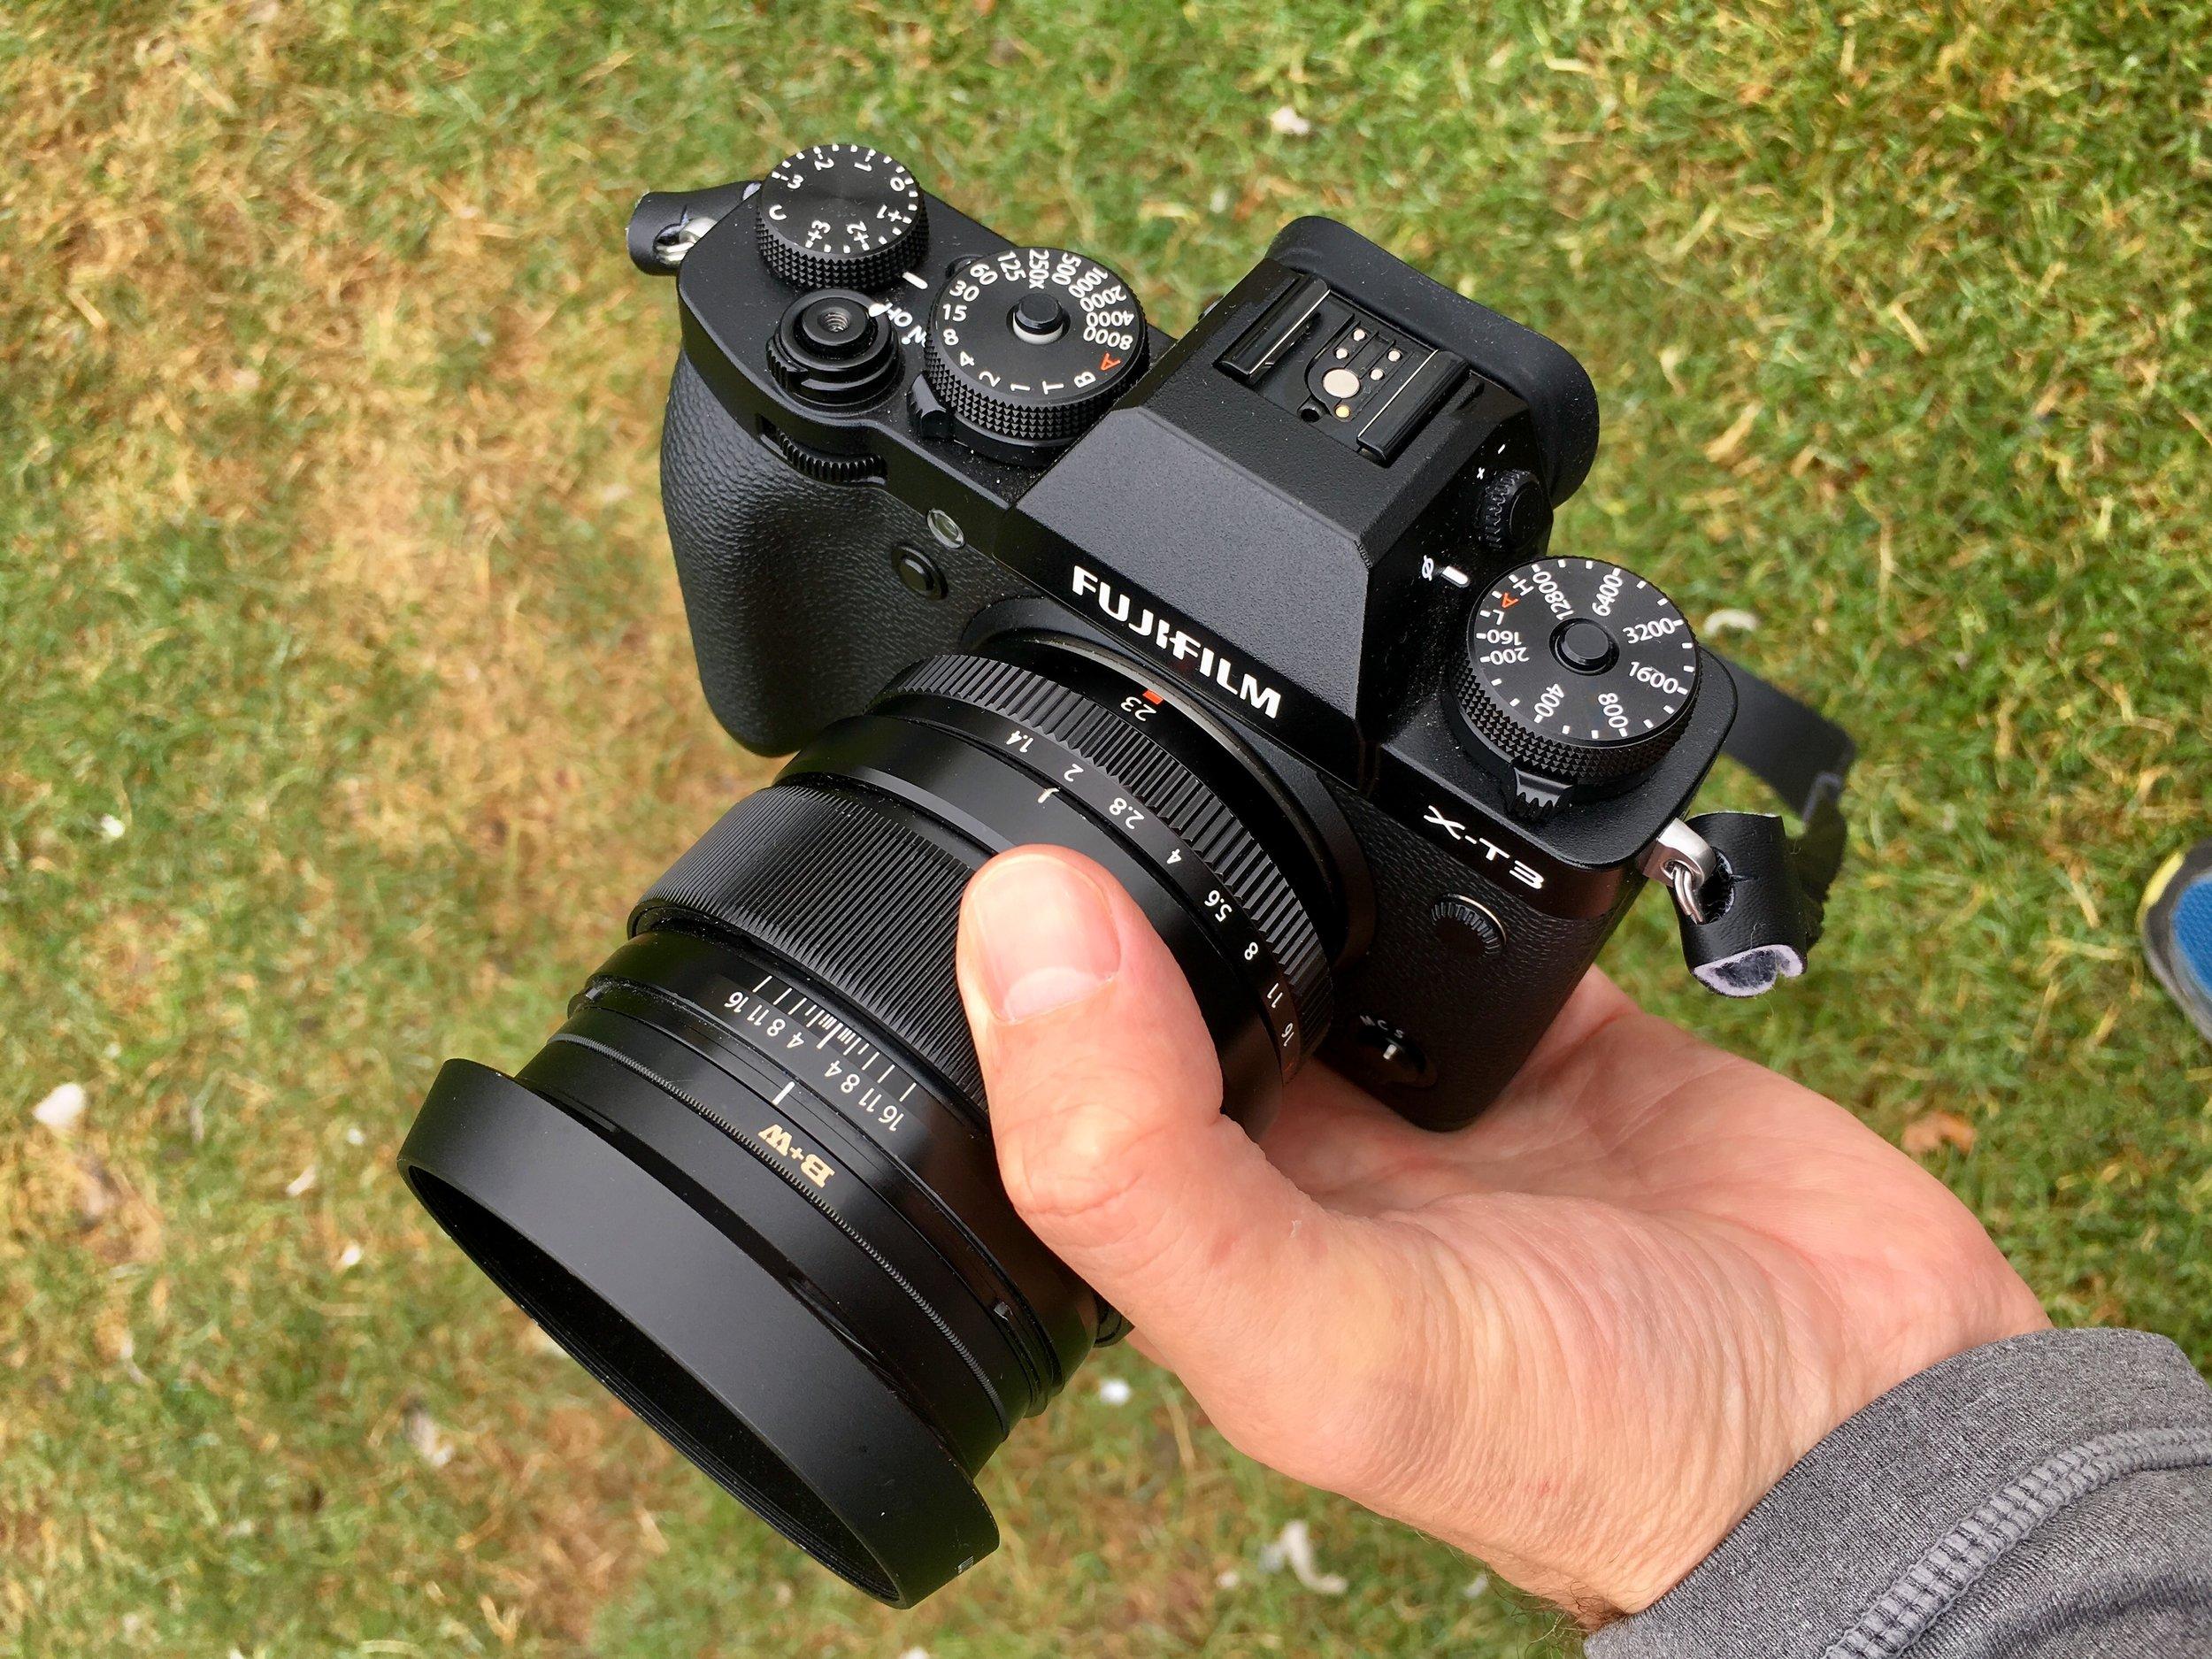 Fujifilm X-T3 with an XF 23mm f/1.4 R